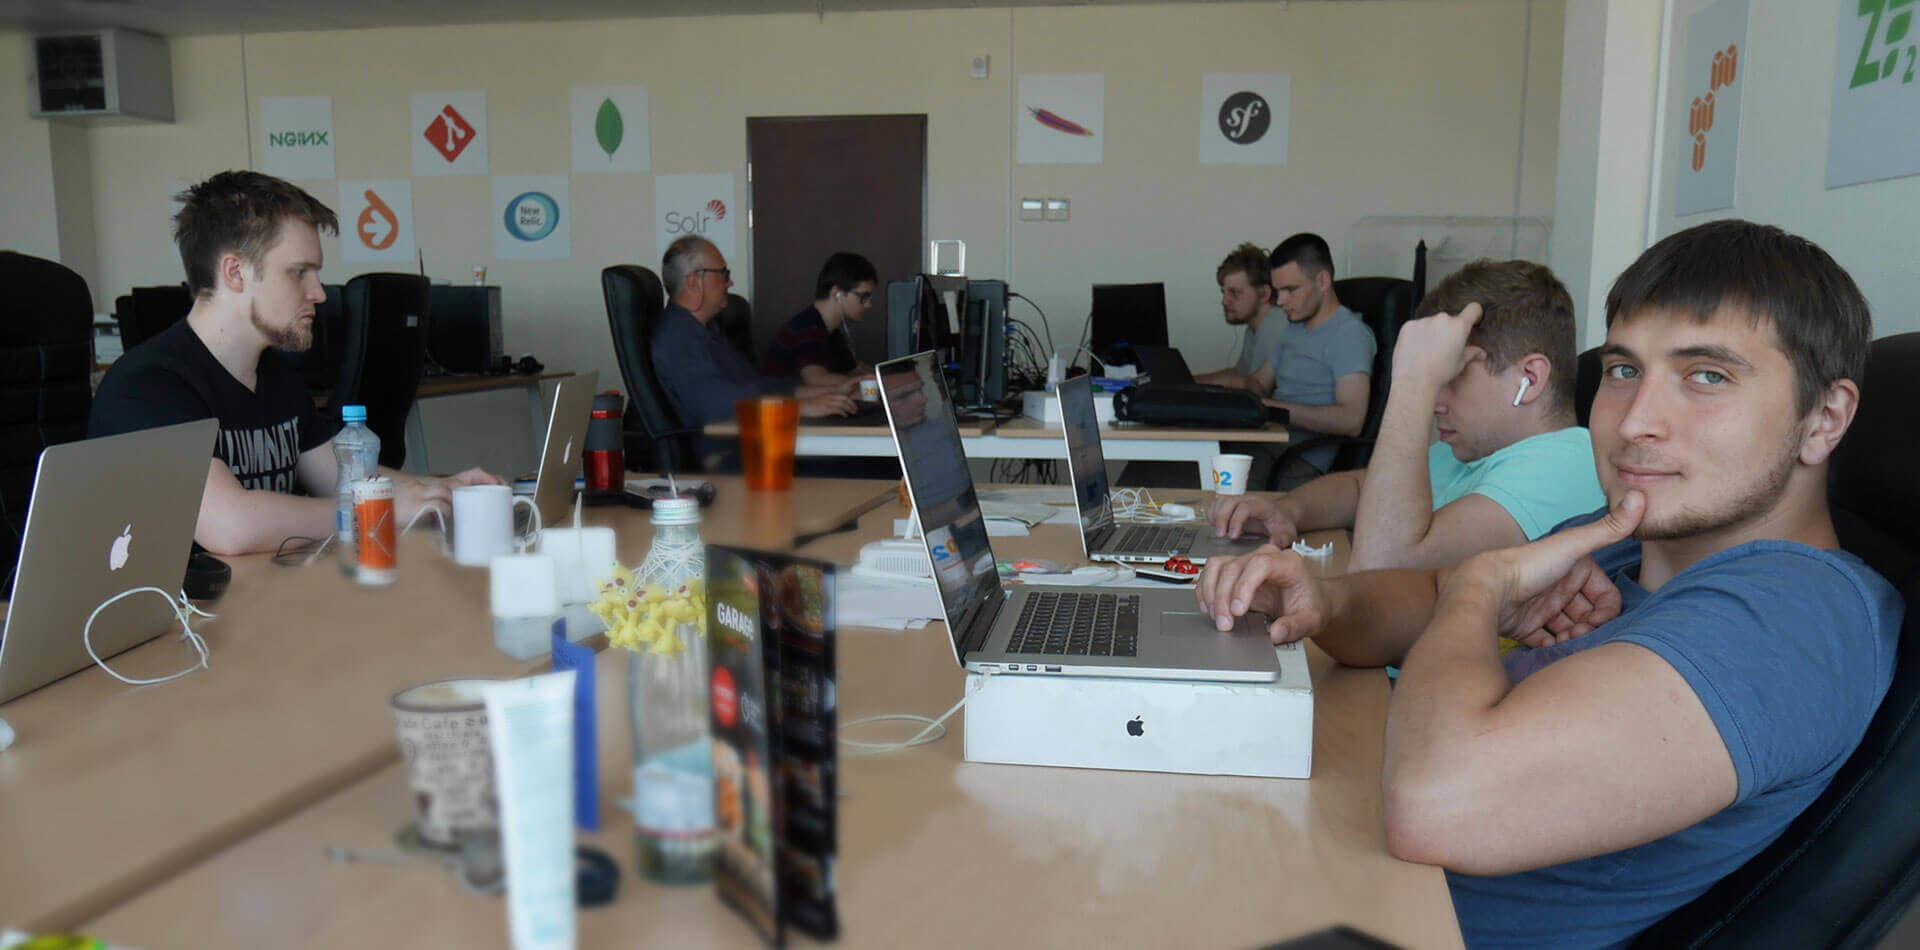 Meet Onilab: your expert Magento development agency| Onilab